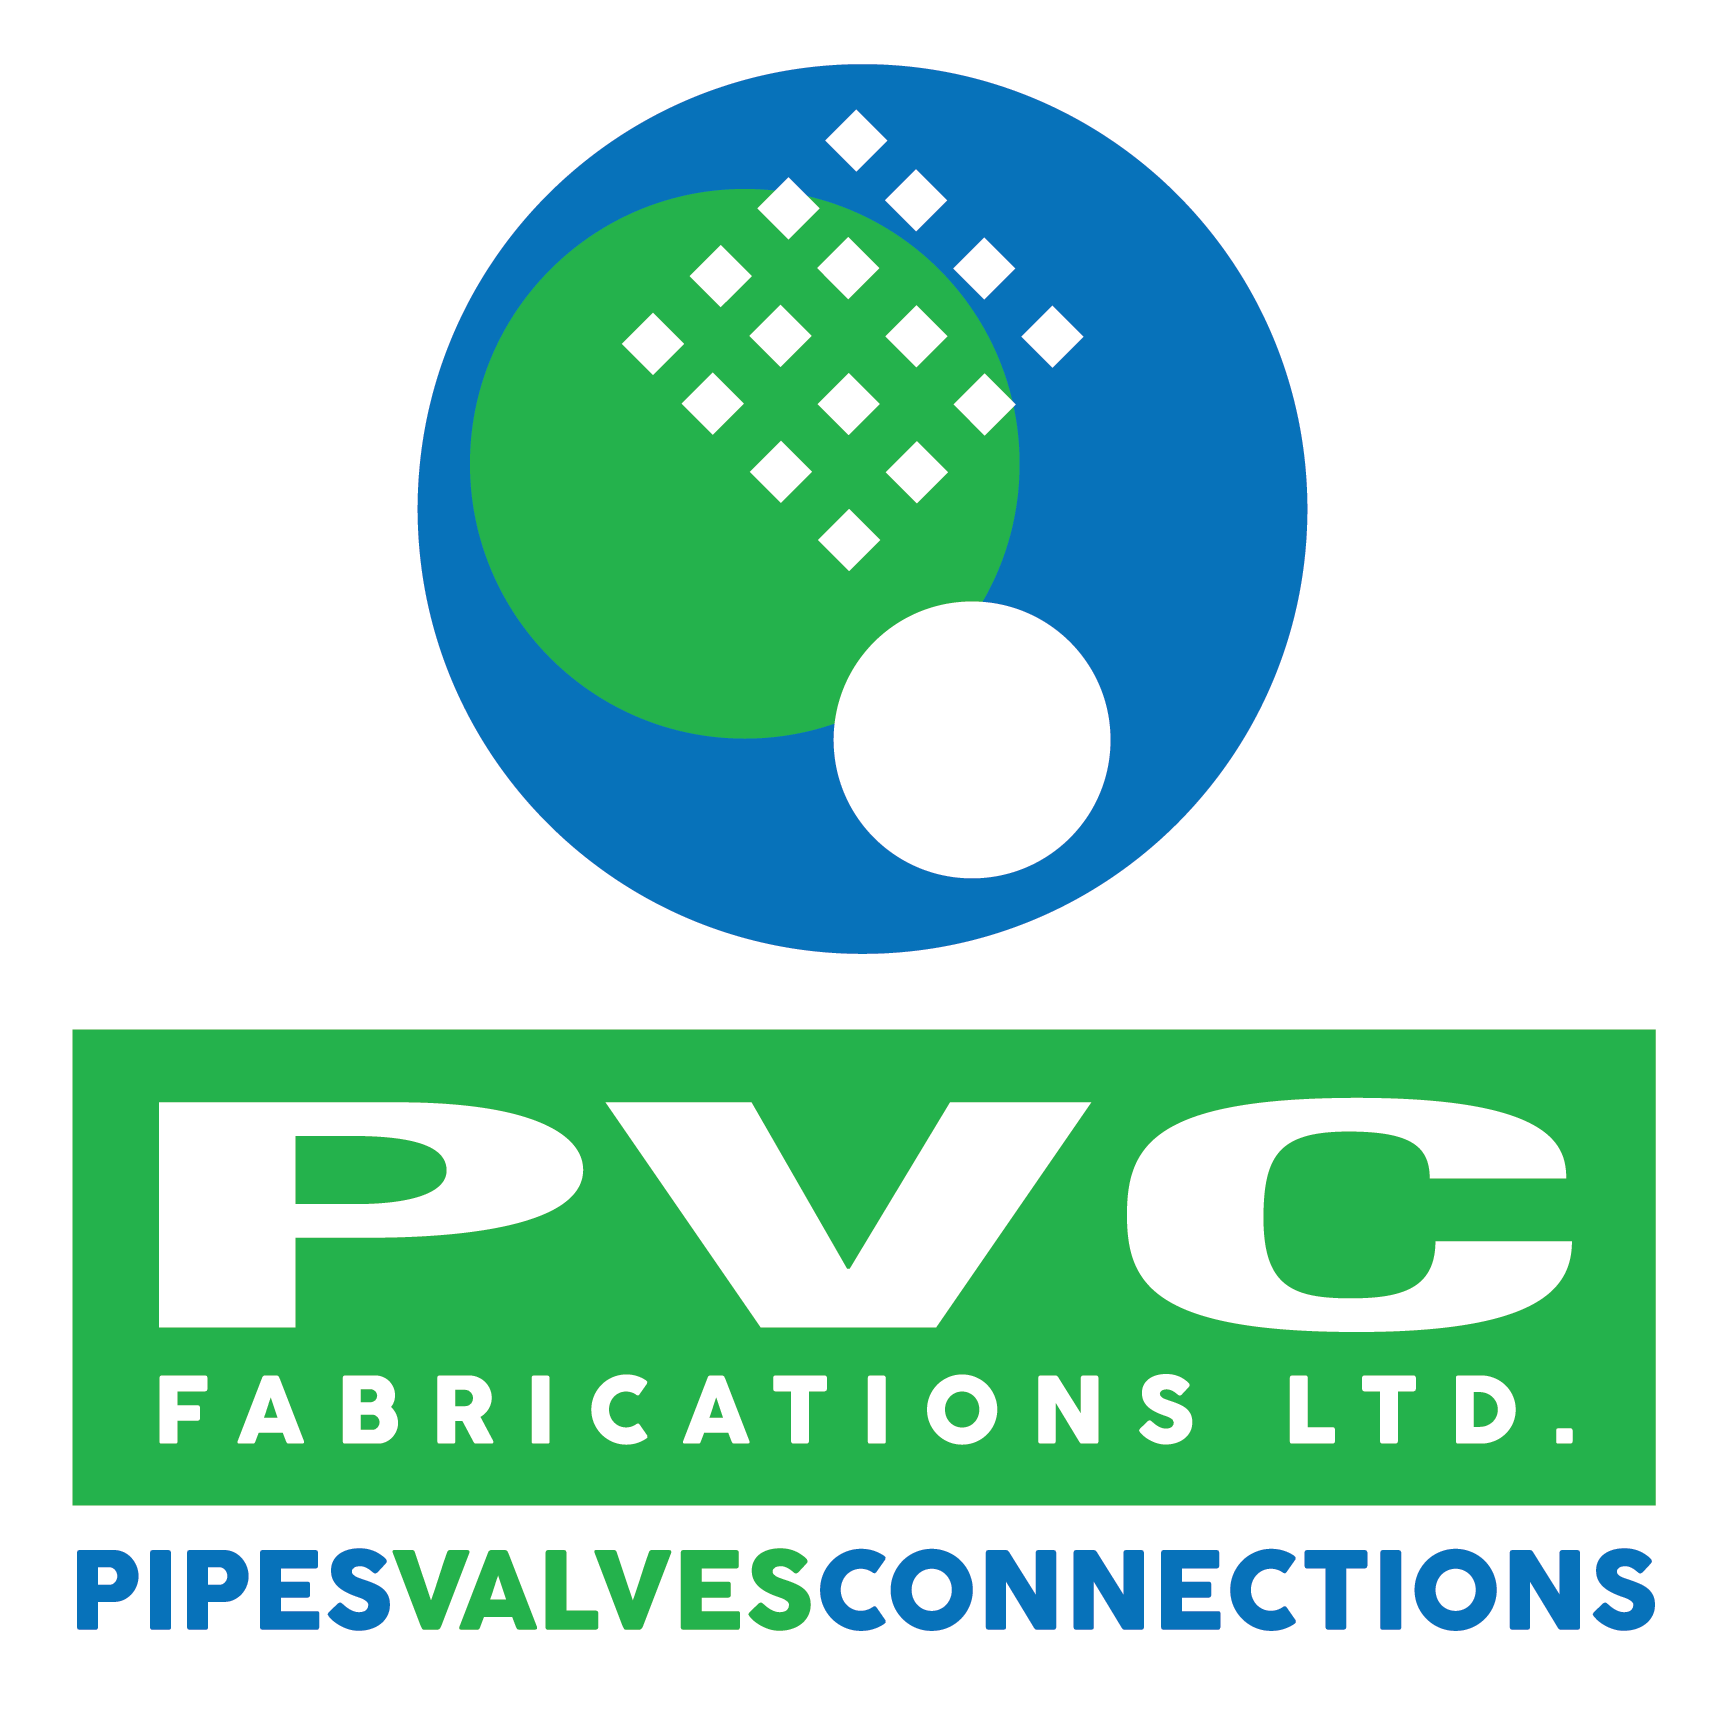 PVC FABRICATIONS